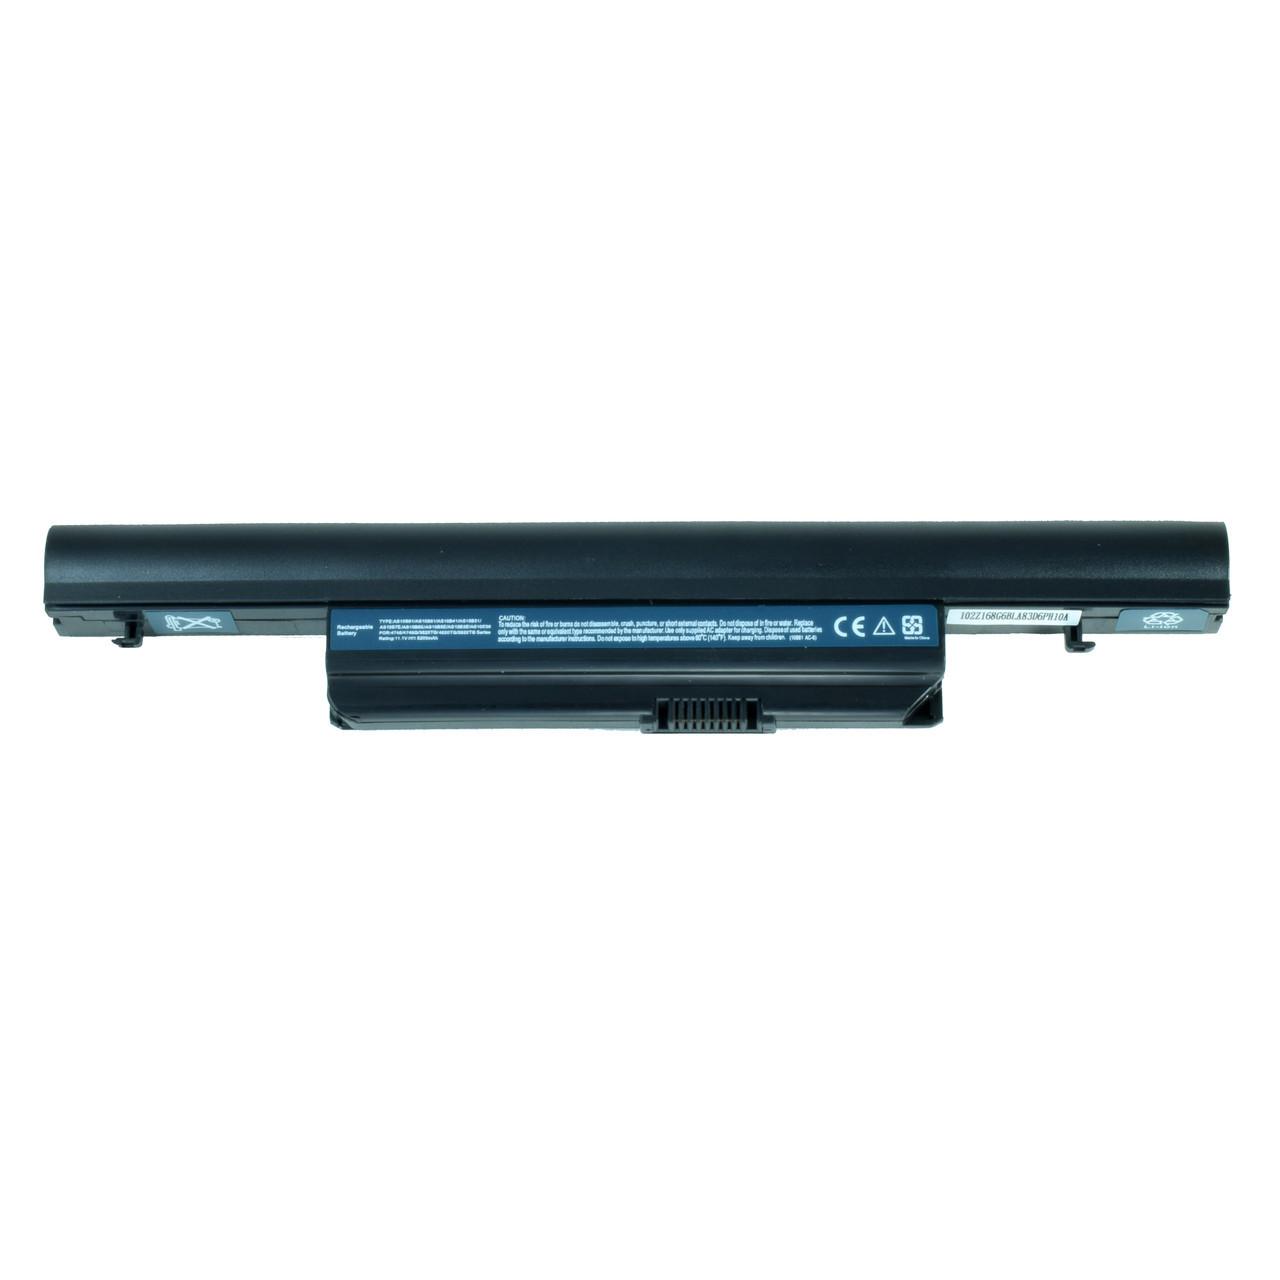 Батарея для ноутбука ACER AS10E36 AK.006 BT.082.BT.00603.110 AS01B41 AS10B31 AS10B3E AS10B41 AS10B51